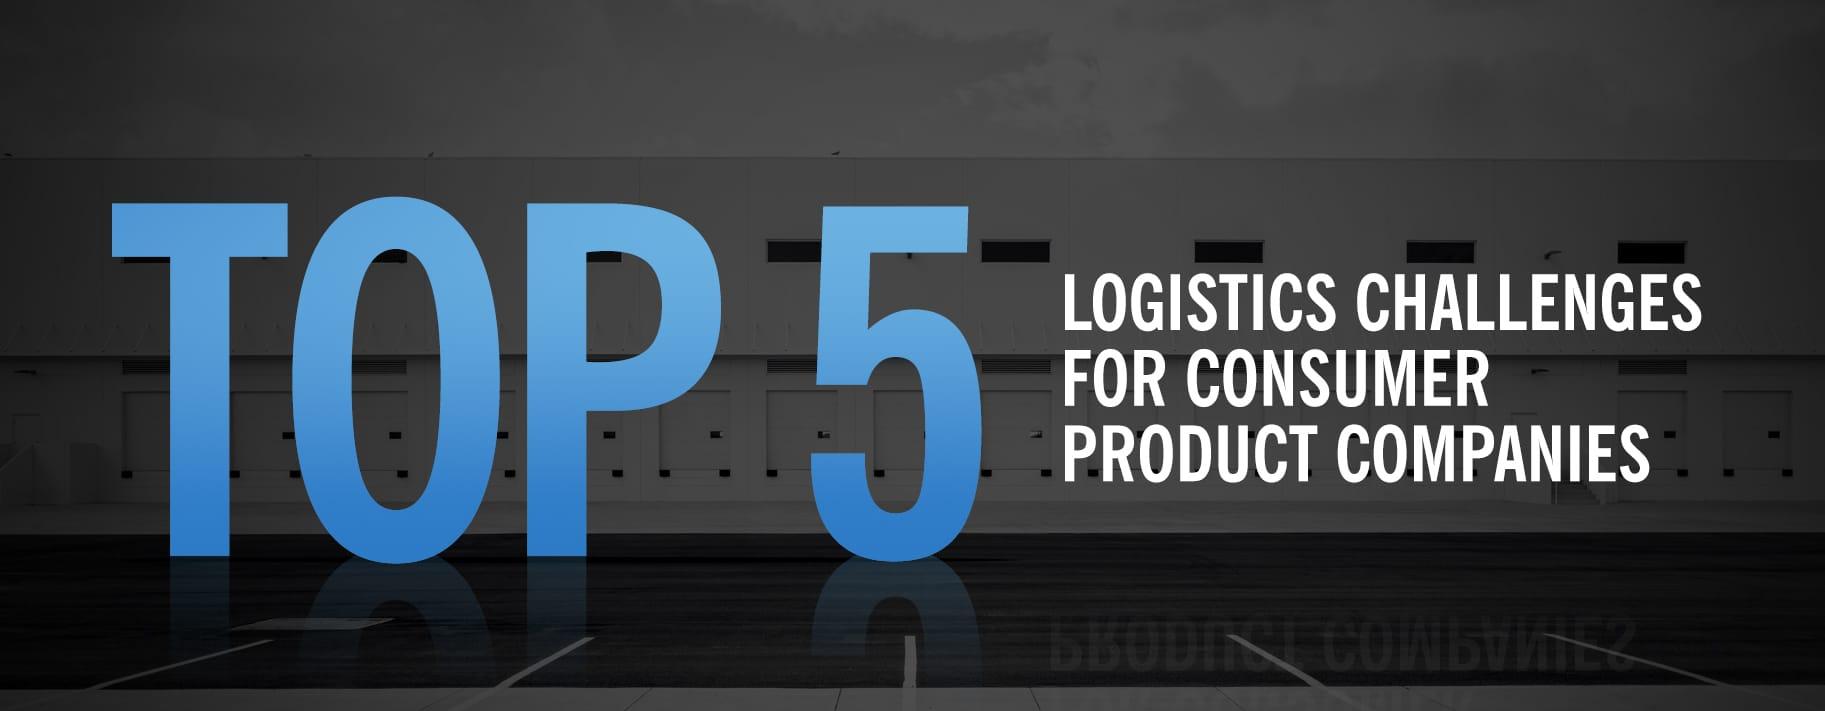 Food Transportation Issues Logistics Problems